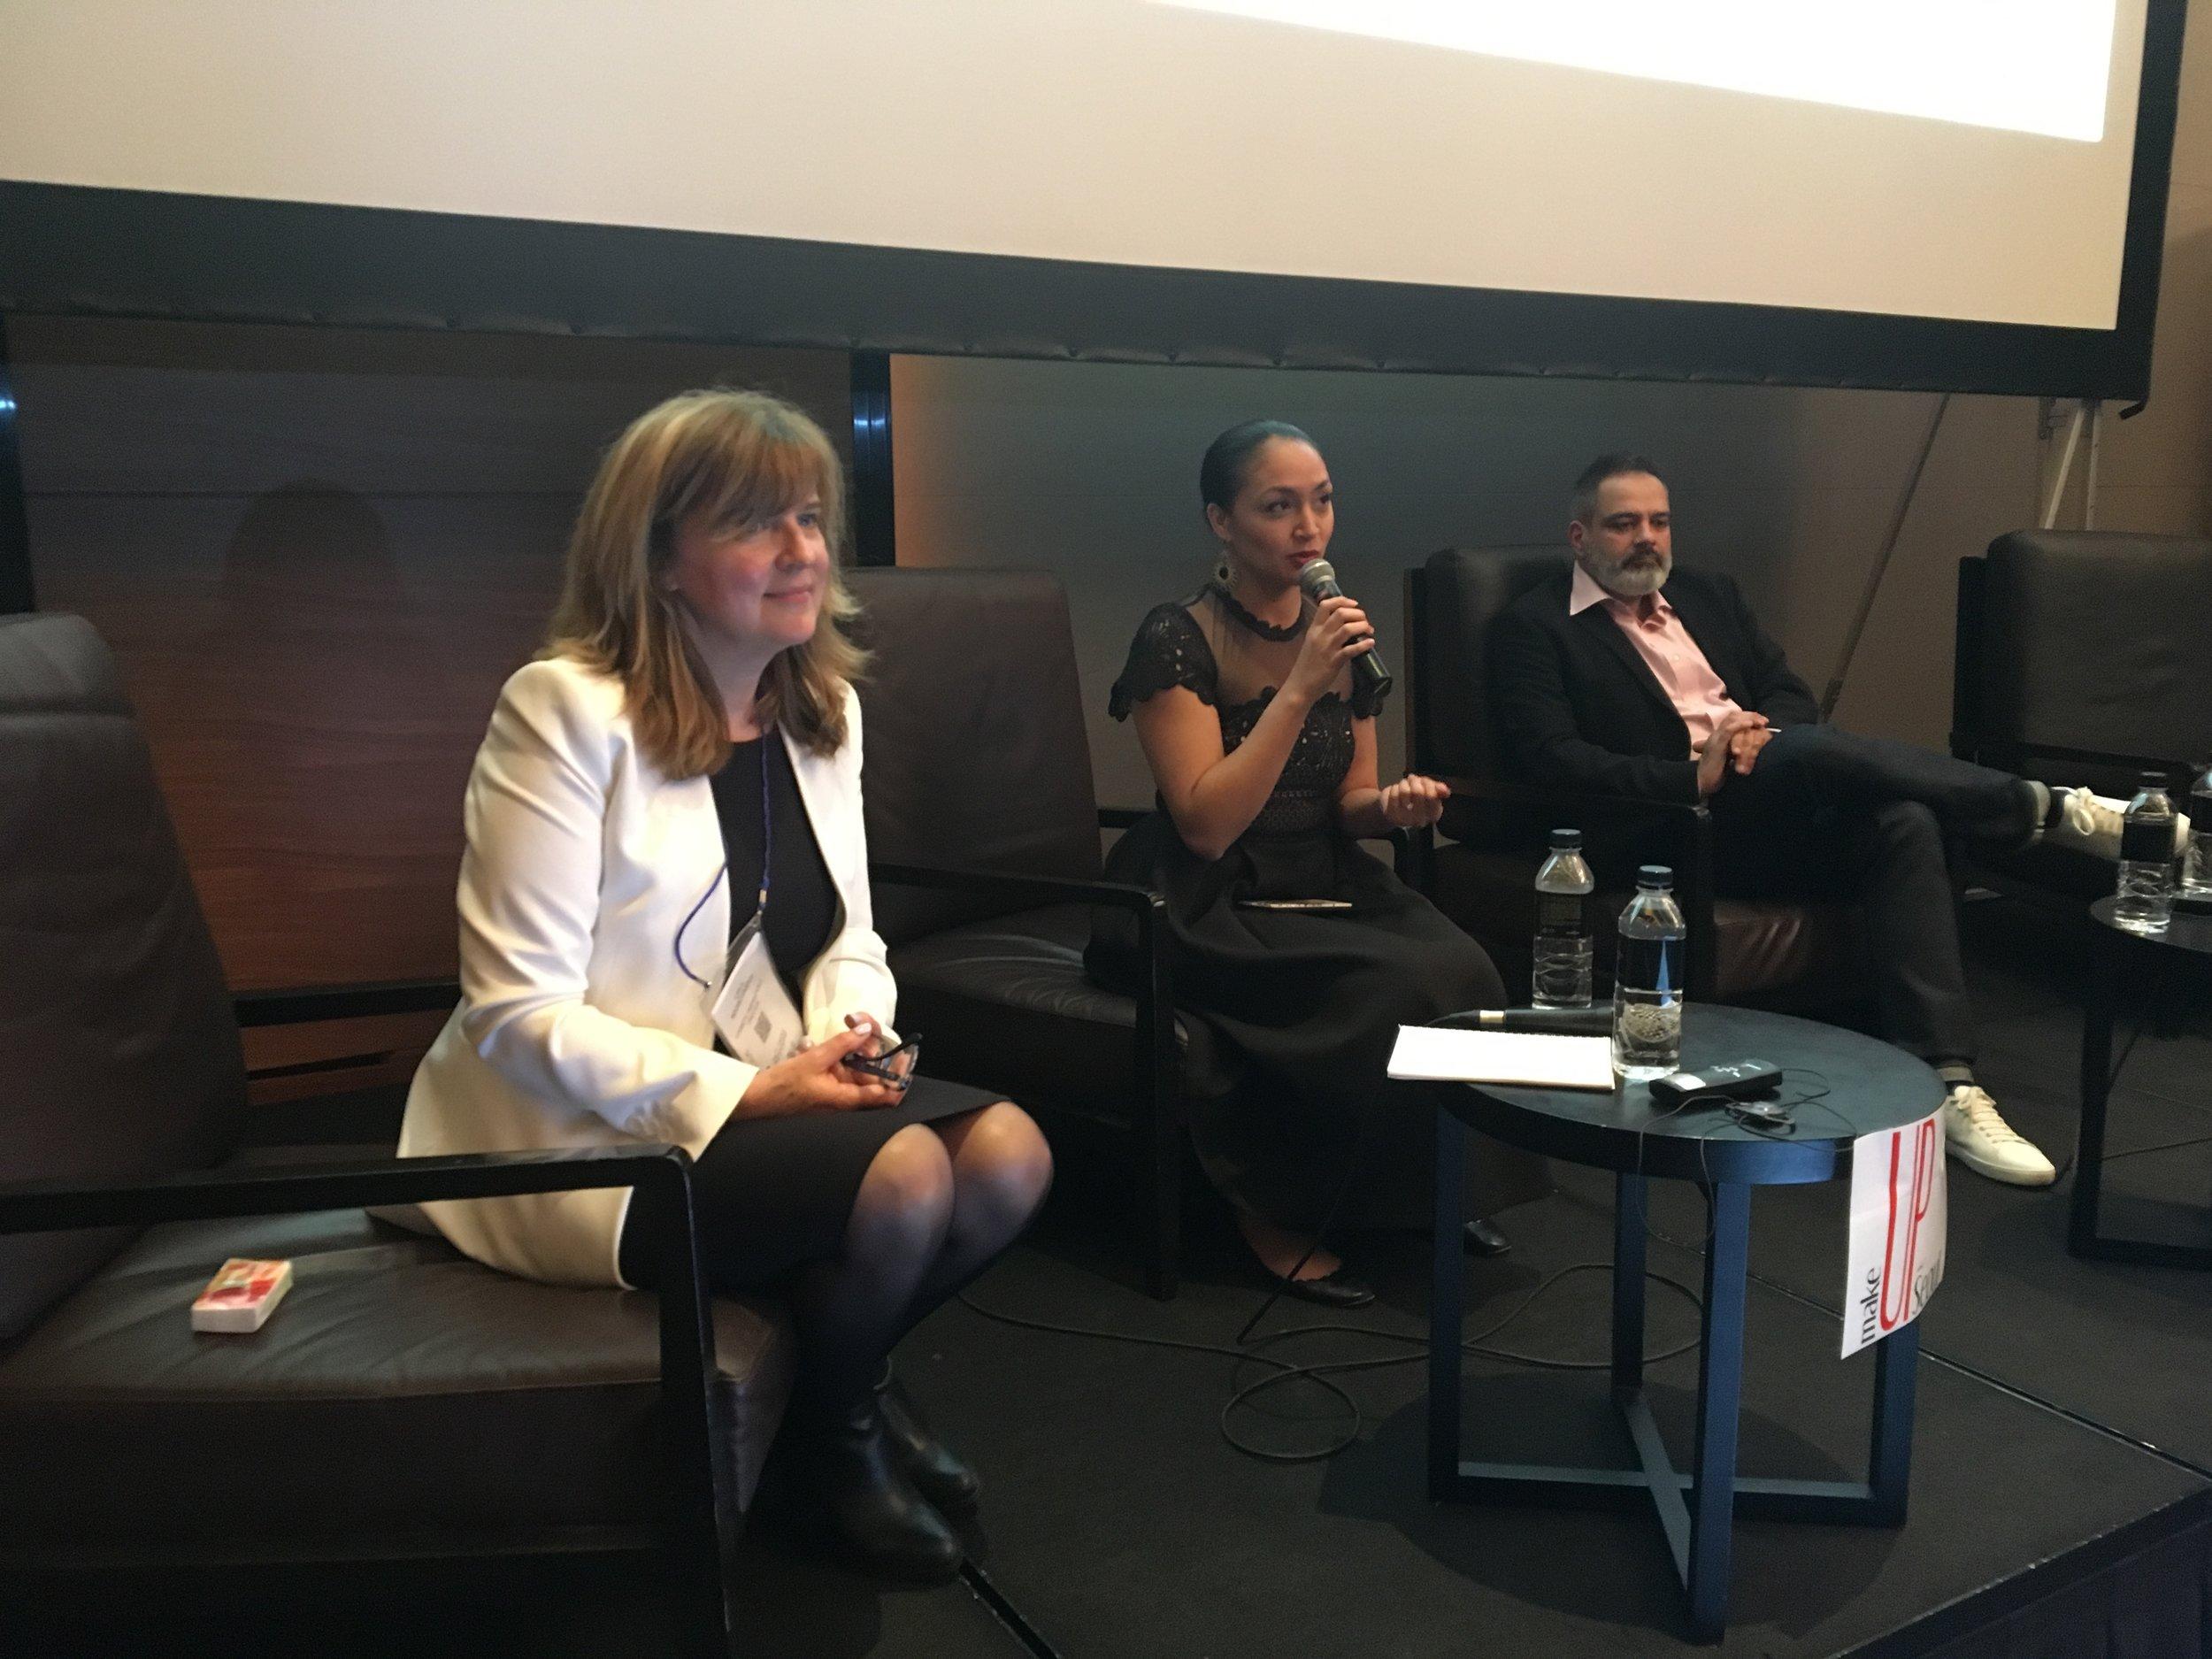 Leila Rochet-Podvin with Nicole Fox (Tribe Dynamics) and Eric Briones (Paris Luxury School).